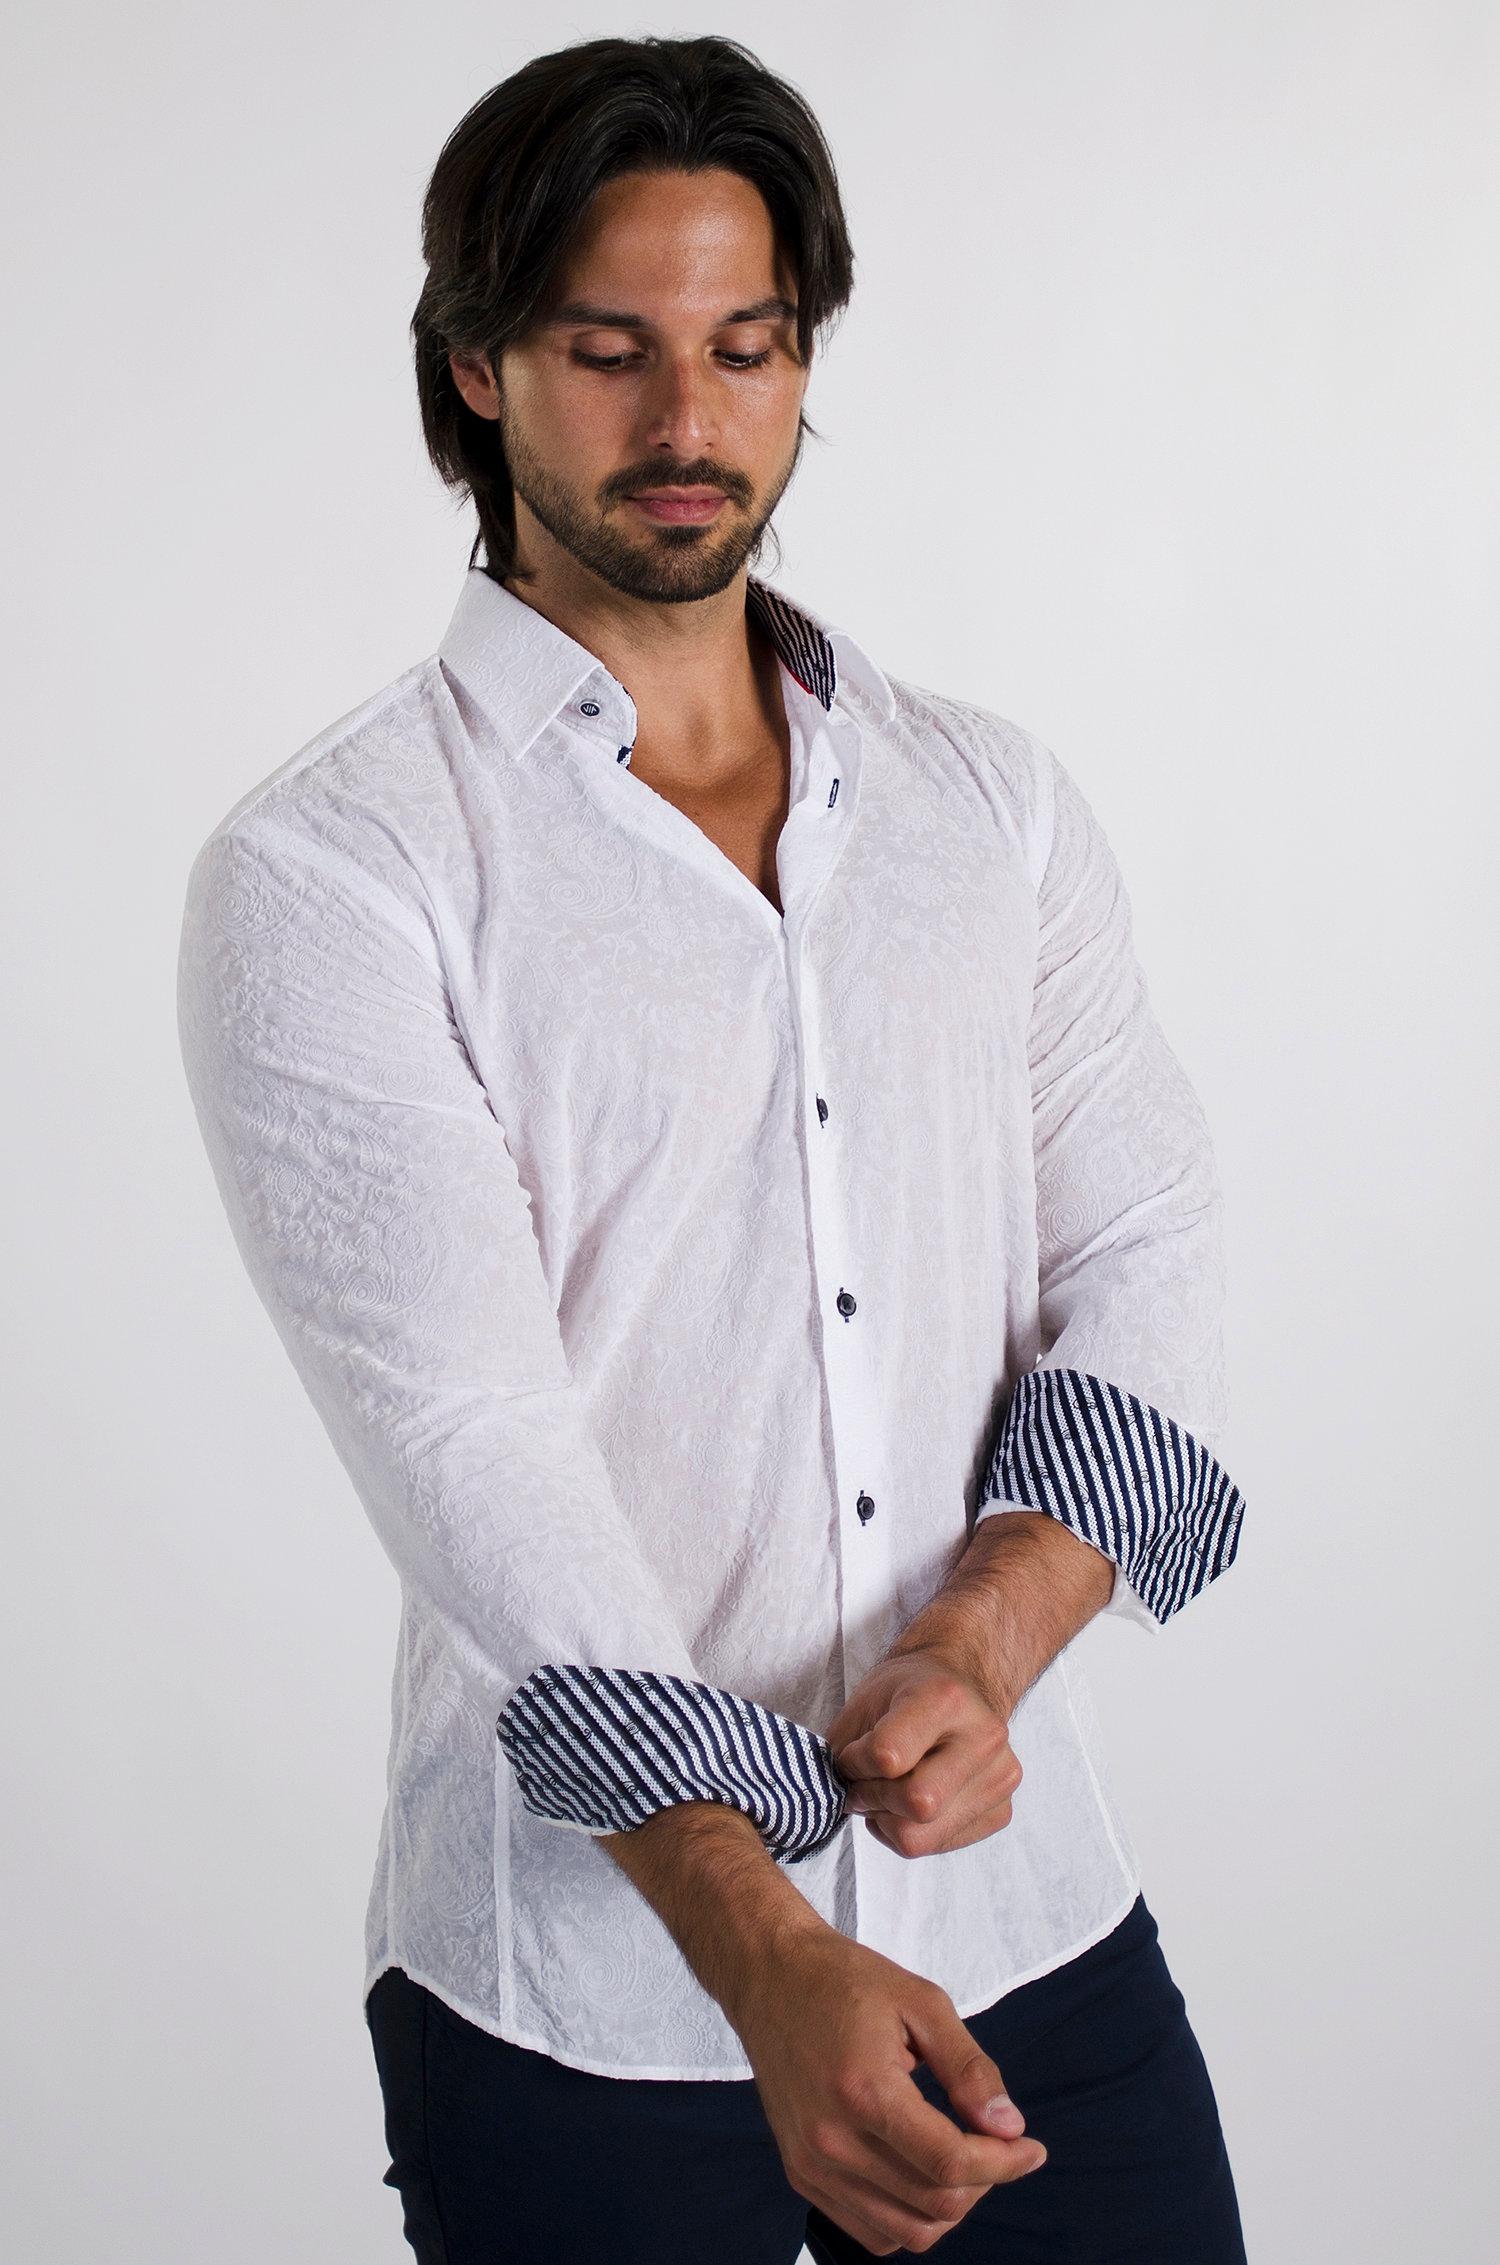 Men 39 s dress shirts men 39 s european dress shirts via uomo for European mens dress shirts